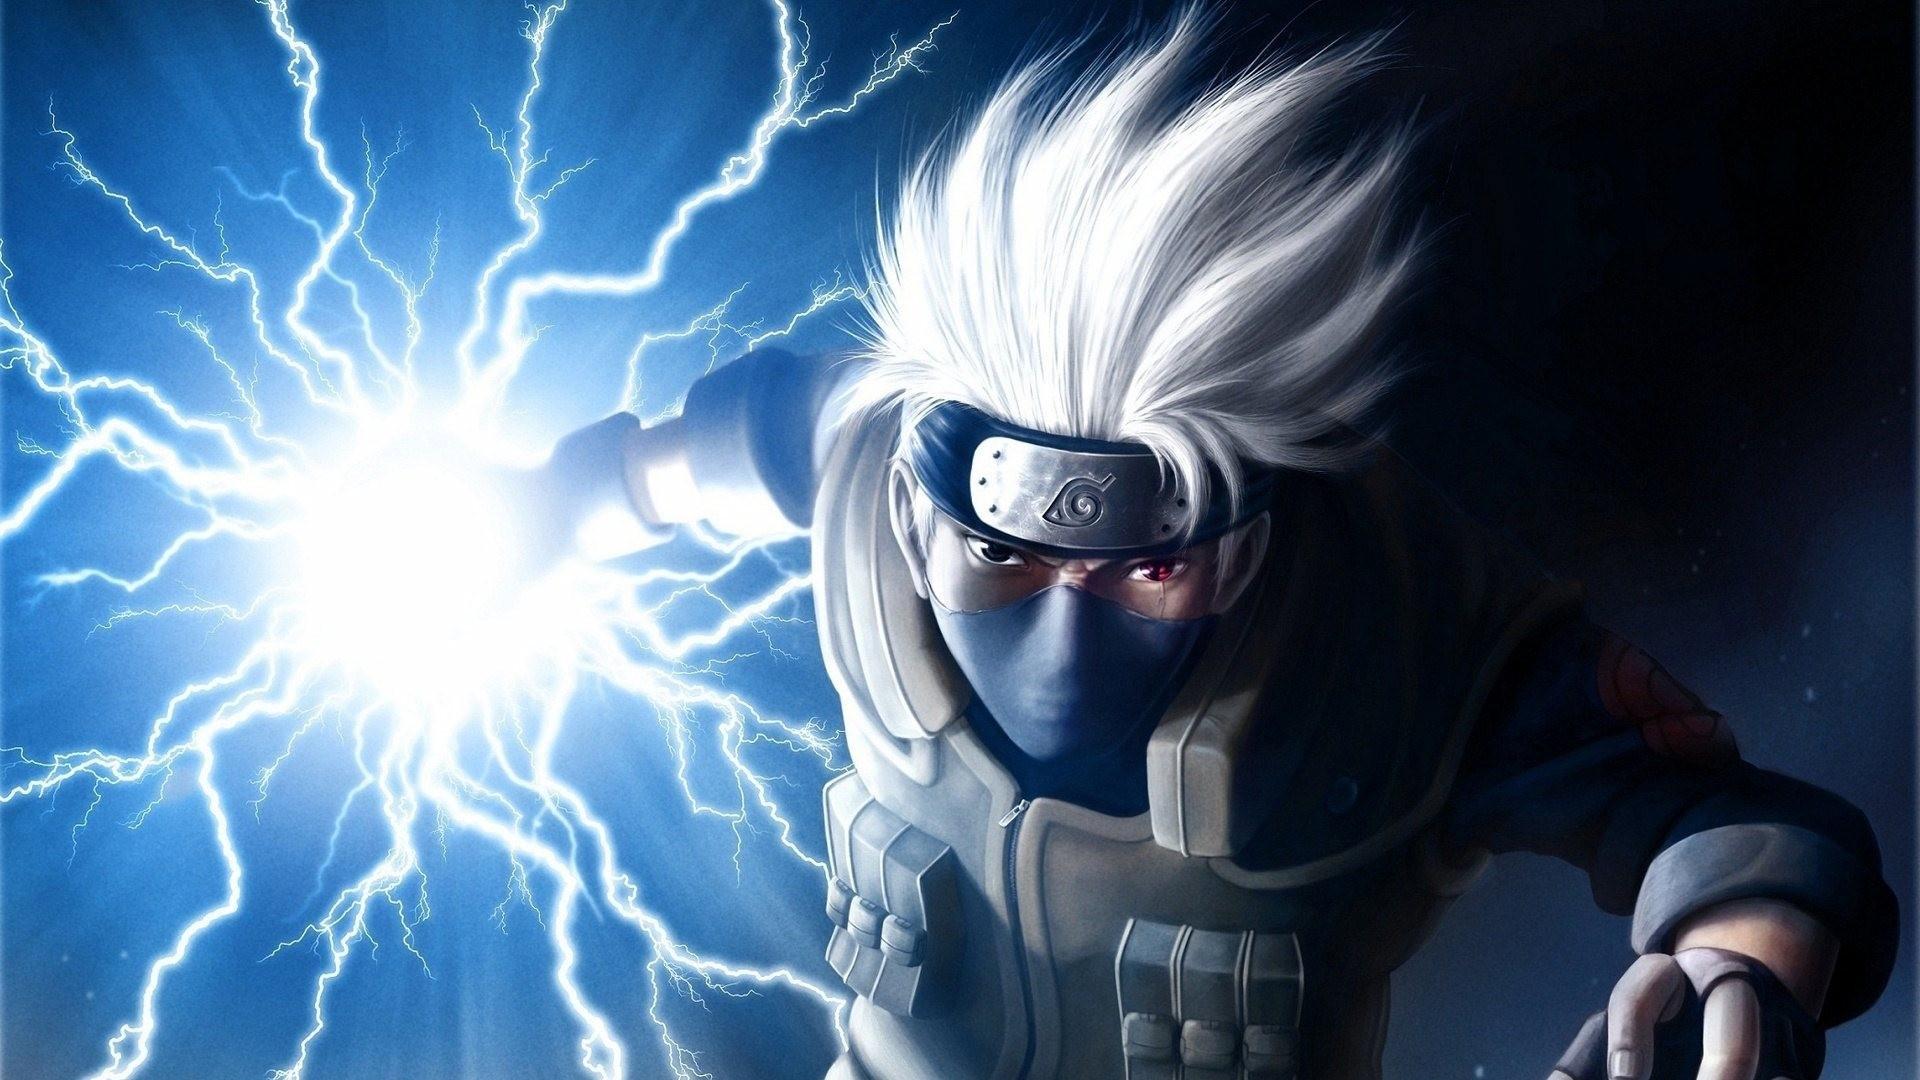 HD Anime Wallpaper 1 Download Free Full Backgrounds For Desktop